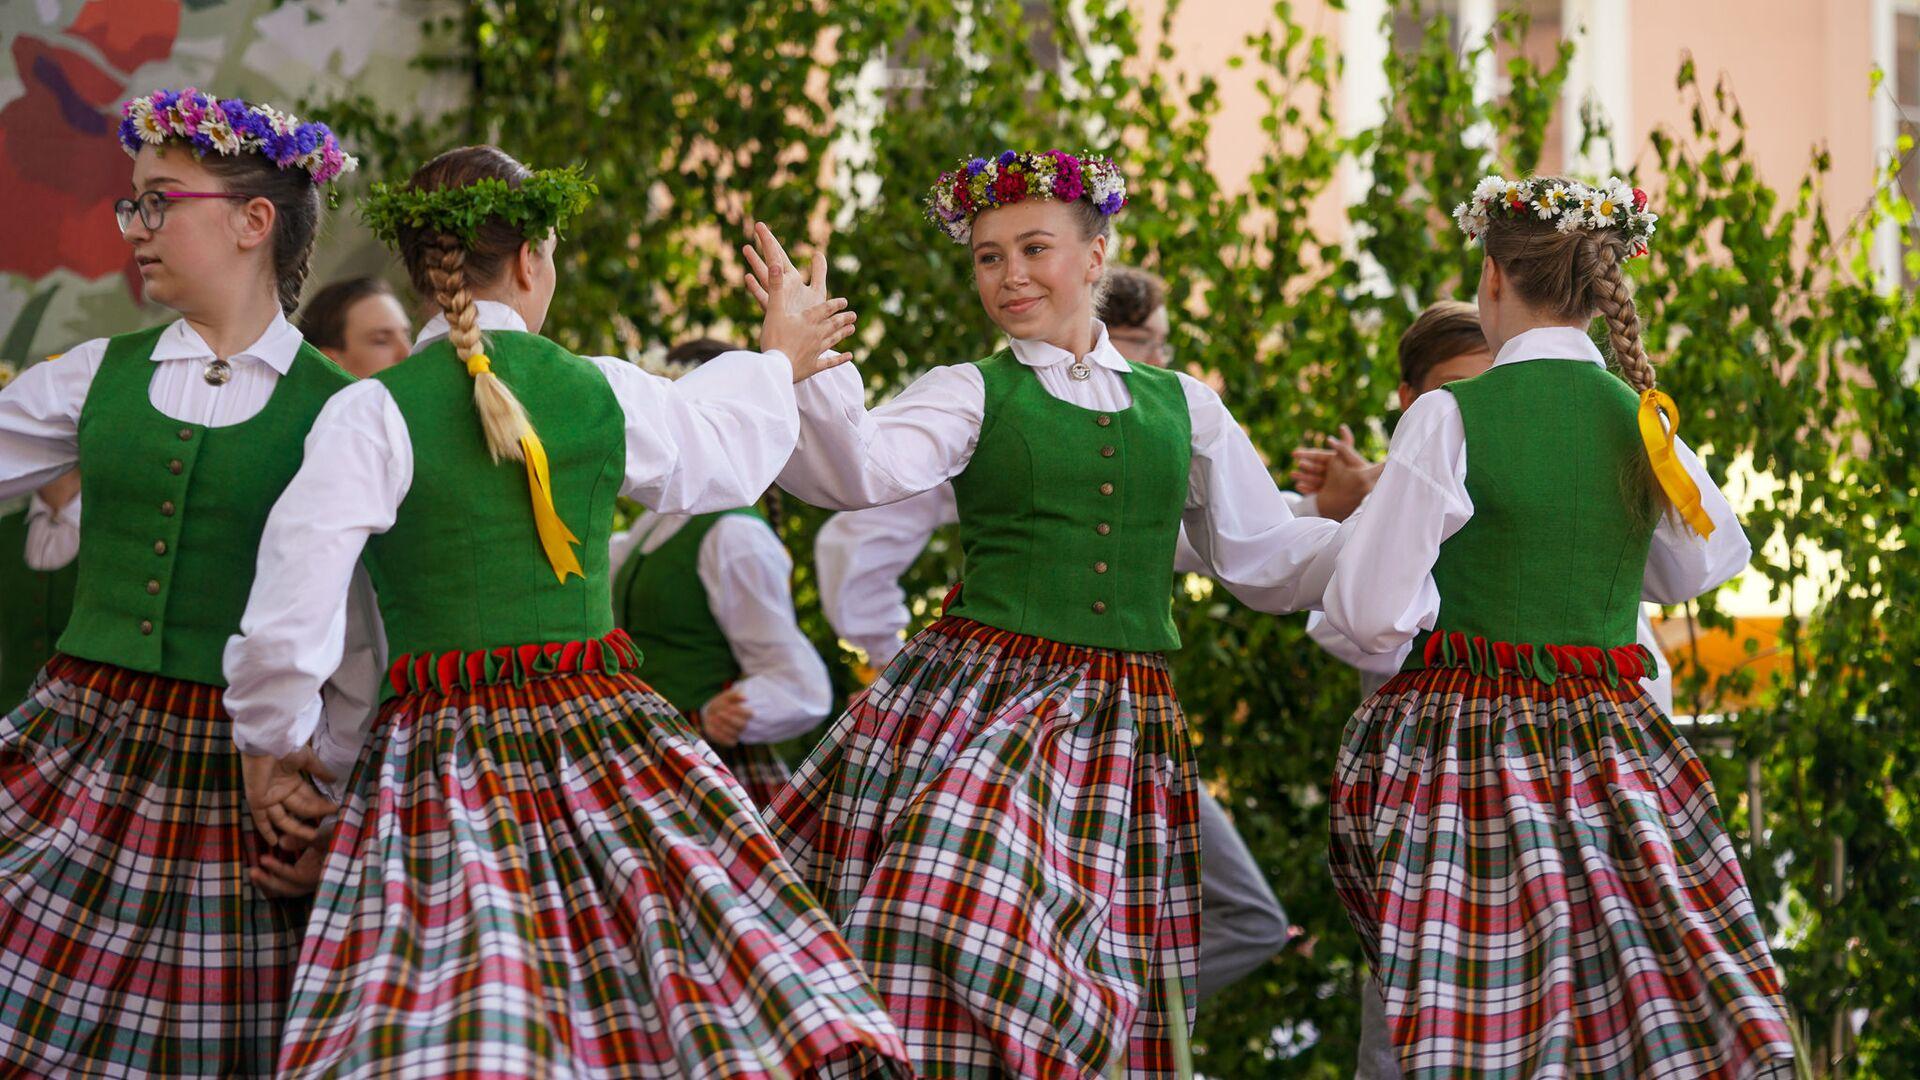 Танцы на ярмарке  - Sputnik Латвия, 1920, 03.07.2021